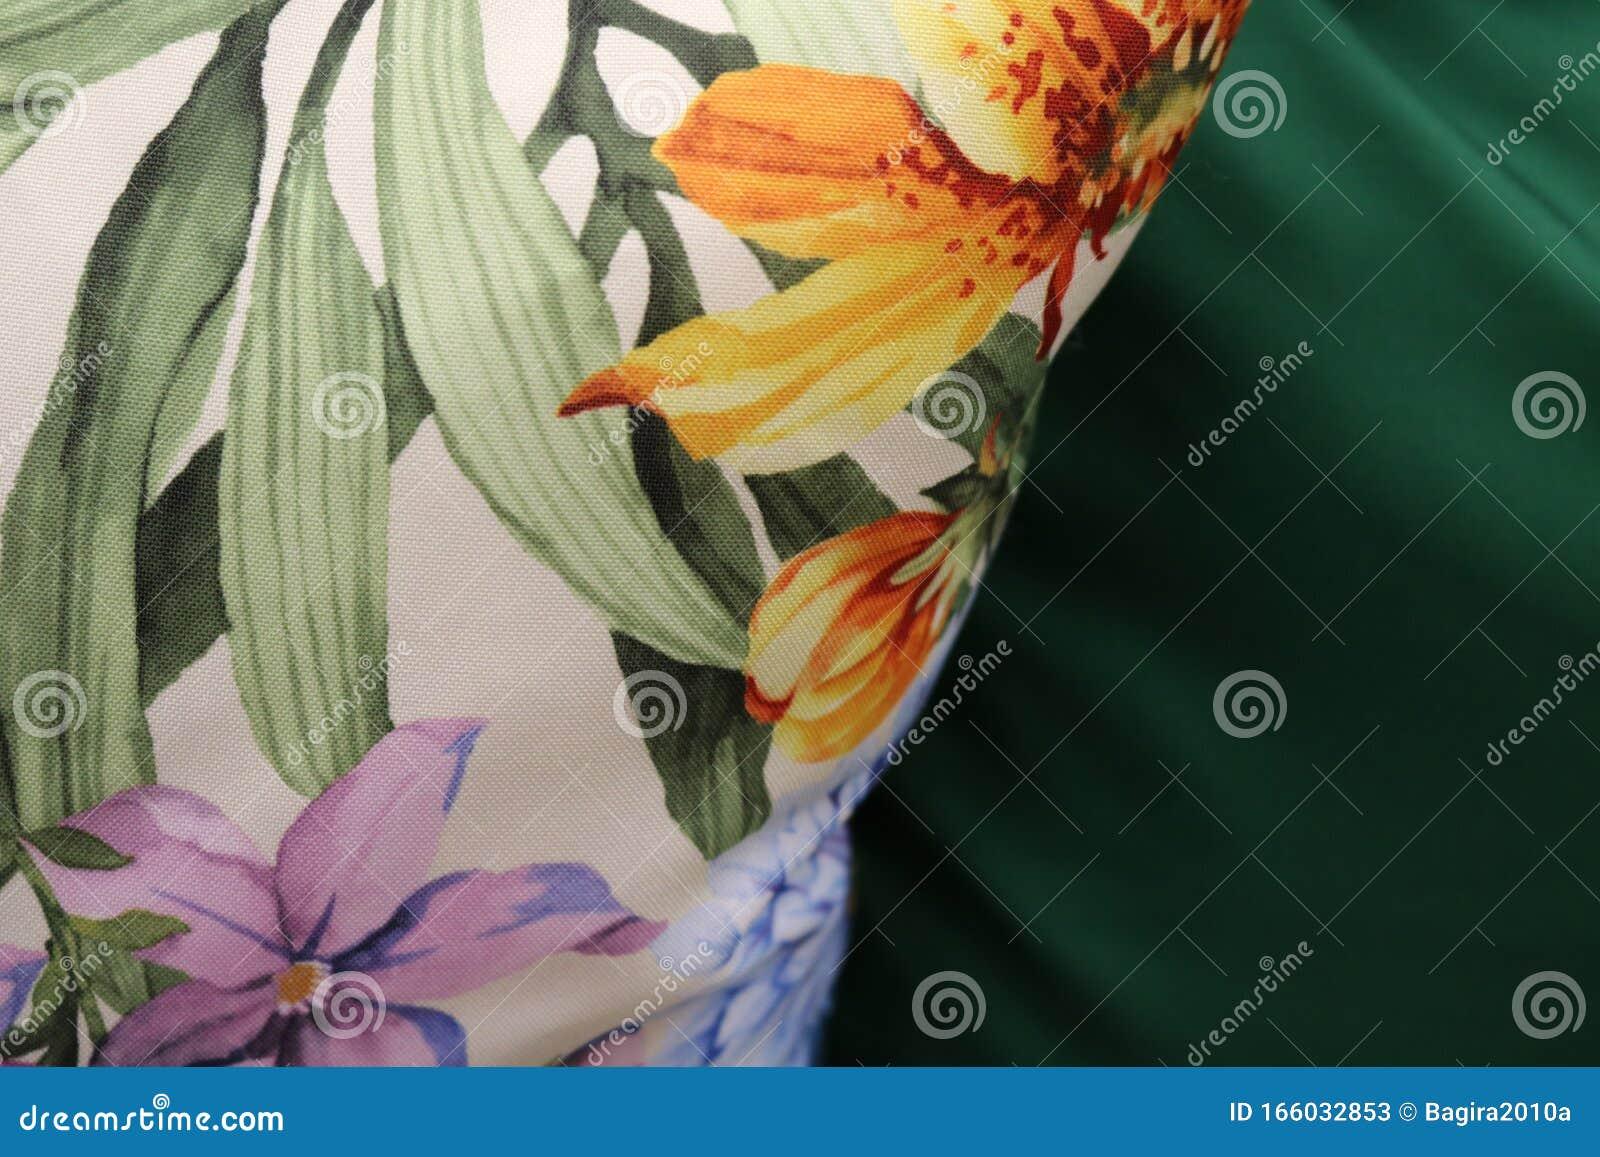 can serve as background further work wallpapers desktop white fabric floral print lies dark green plain 166032853